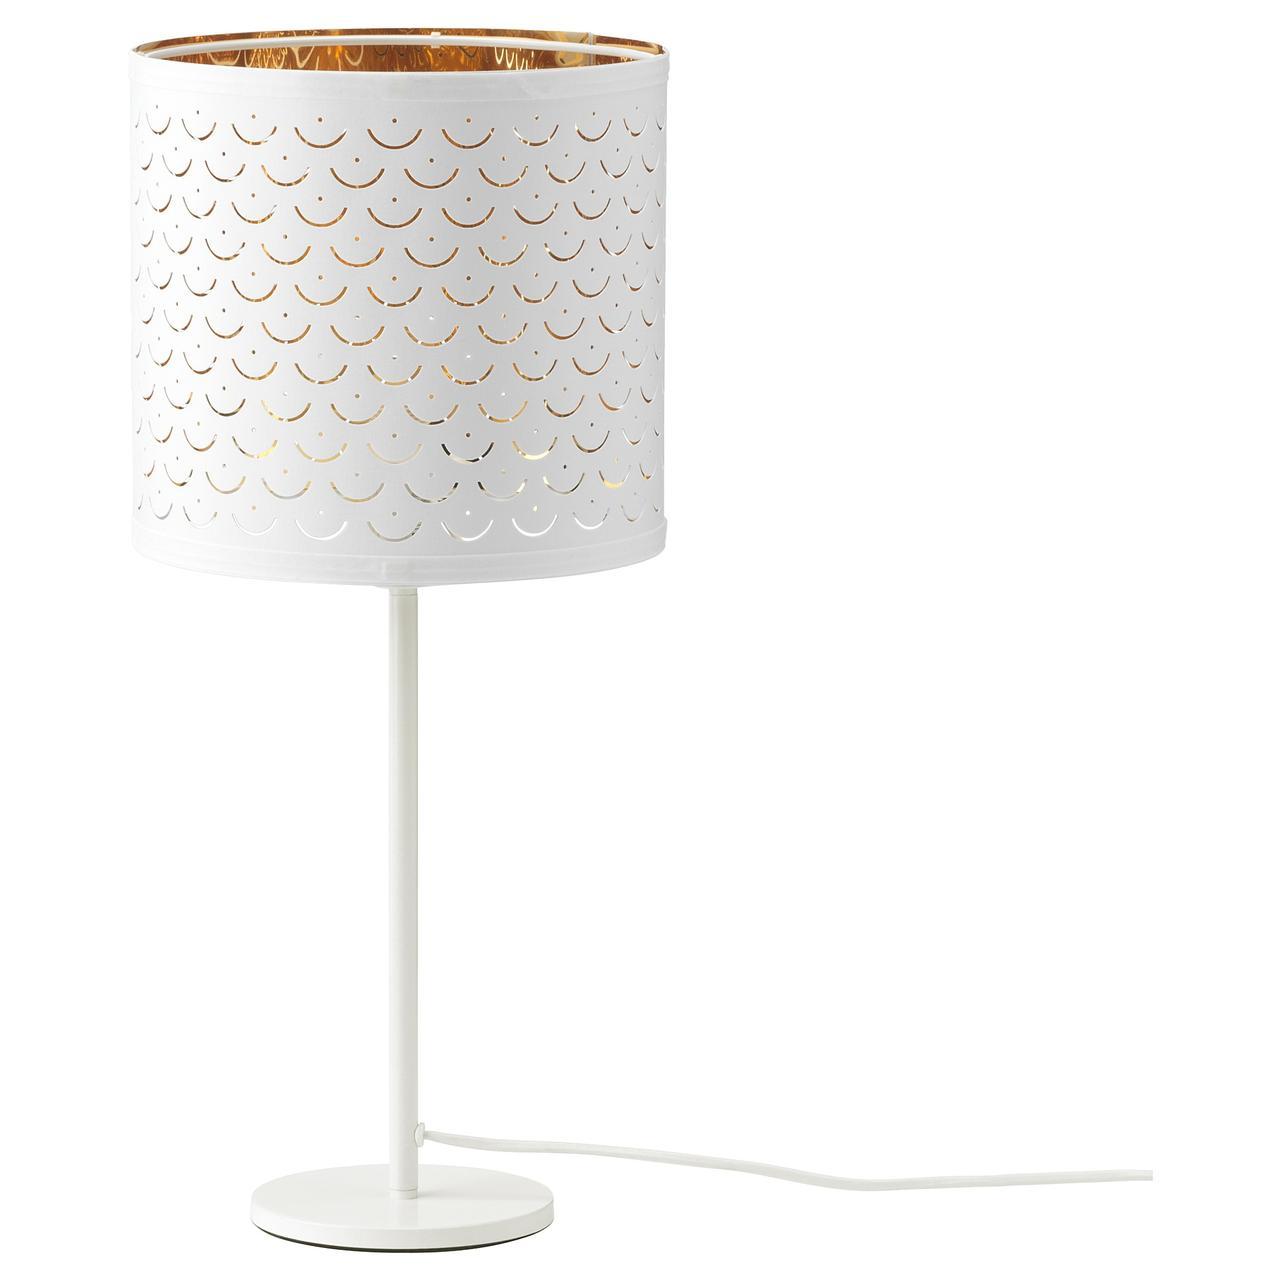 НИМО / РОДД Лампа настольная, белый латунь, белый